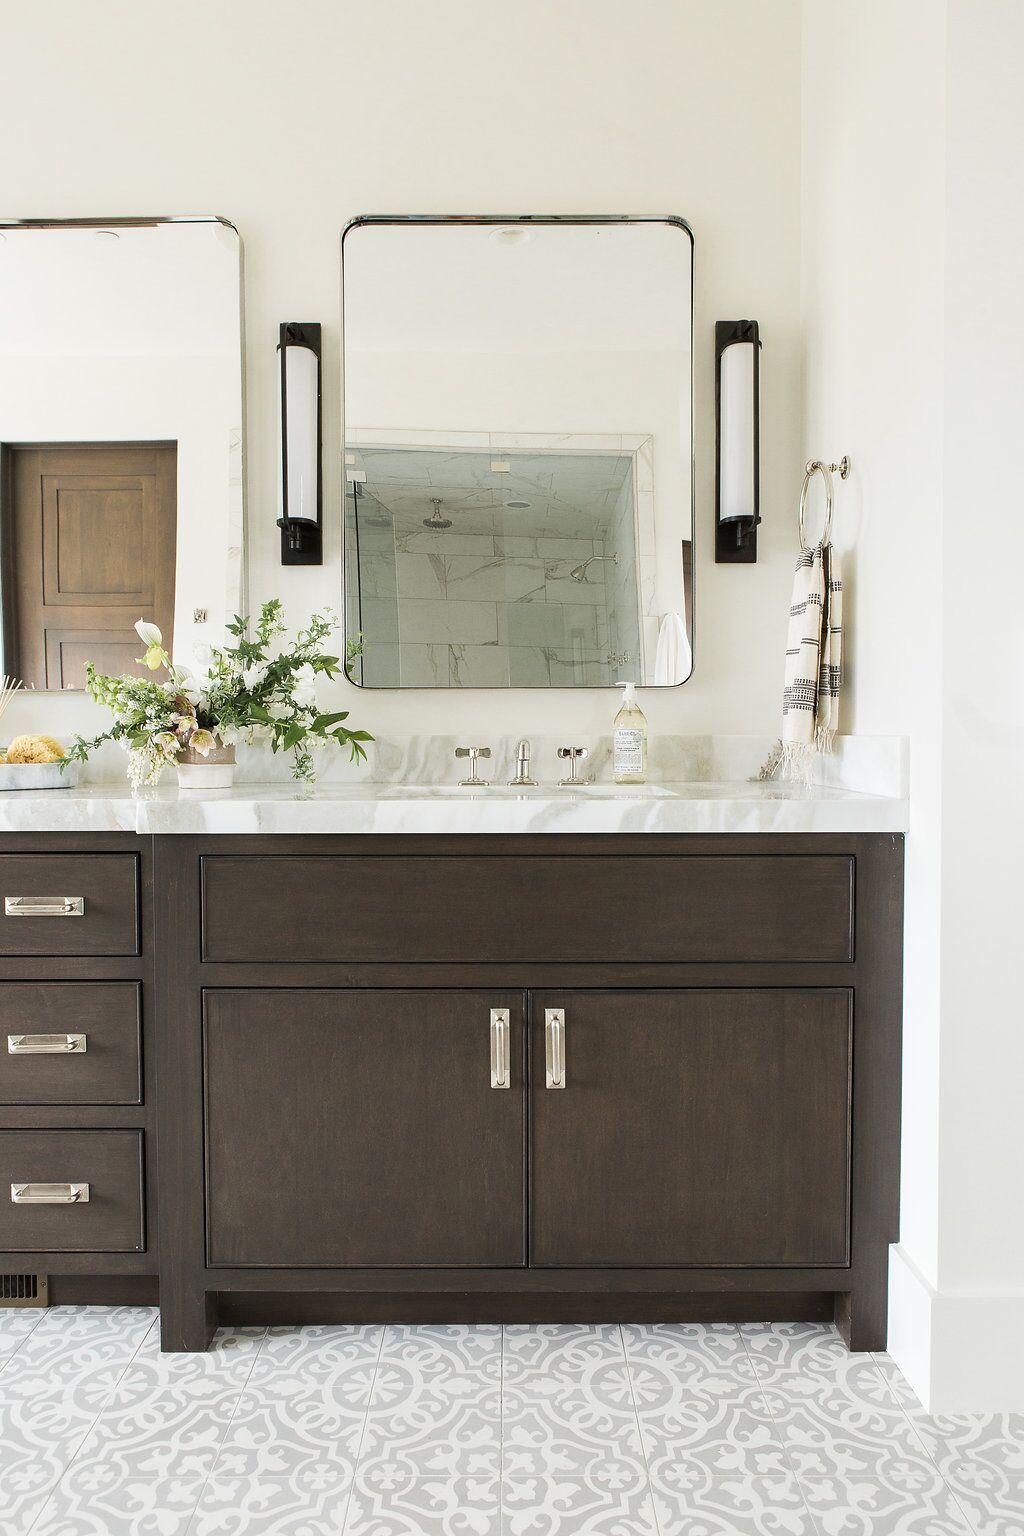 promontory project main floor master suite  mirror hanging  - bath